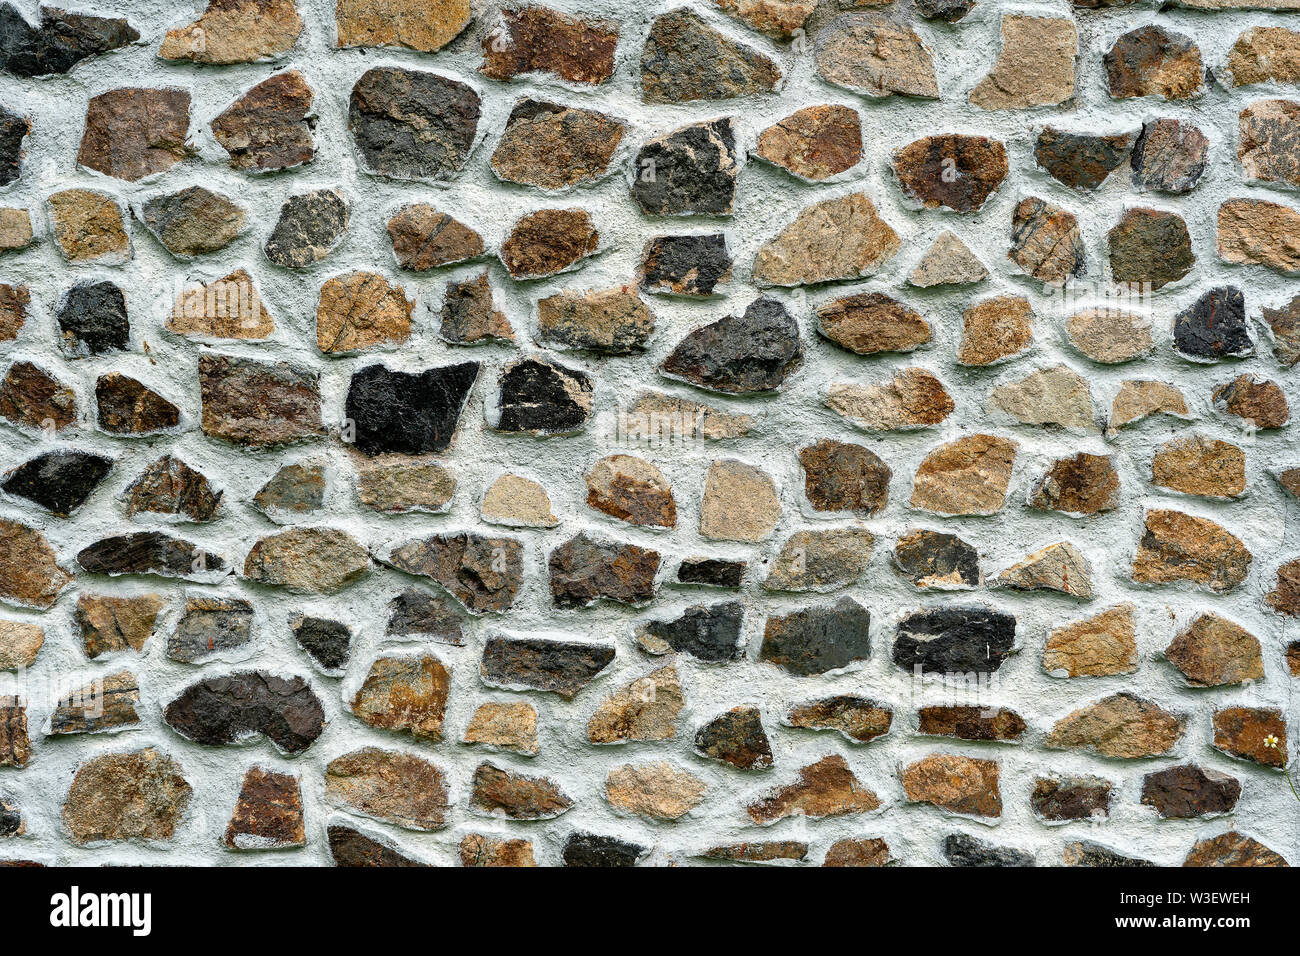 Texture de fond de mur de pierre, Close up. Façade en pierre naturelle, texture carreaux de mur Photo Stock